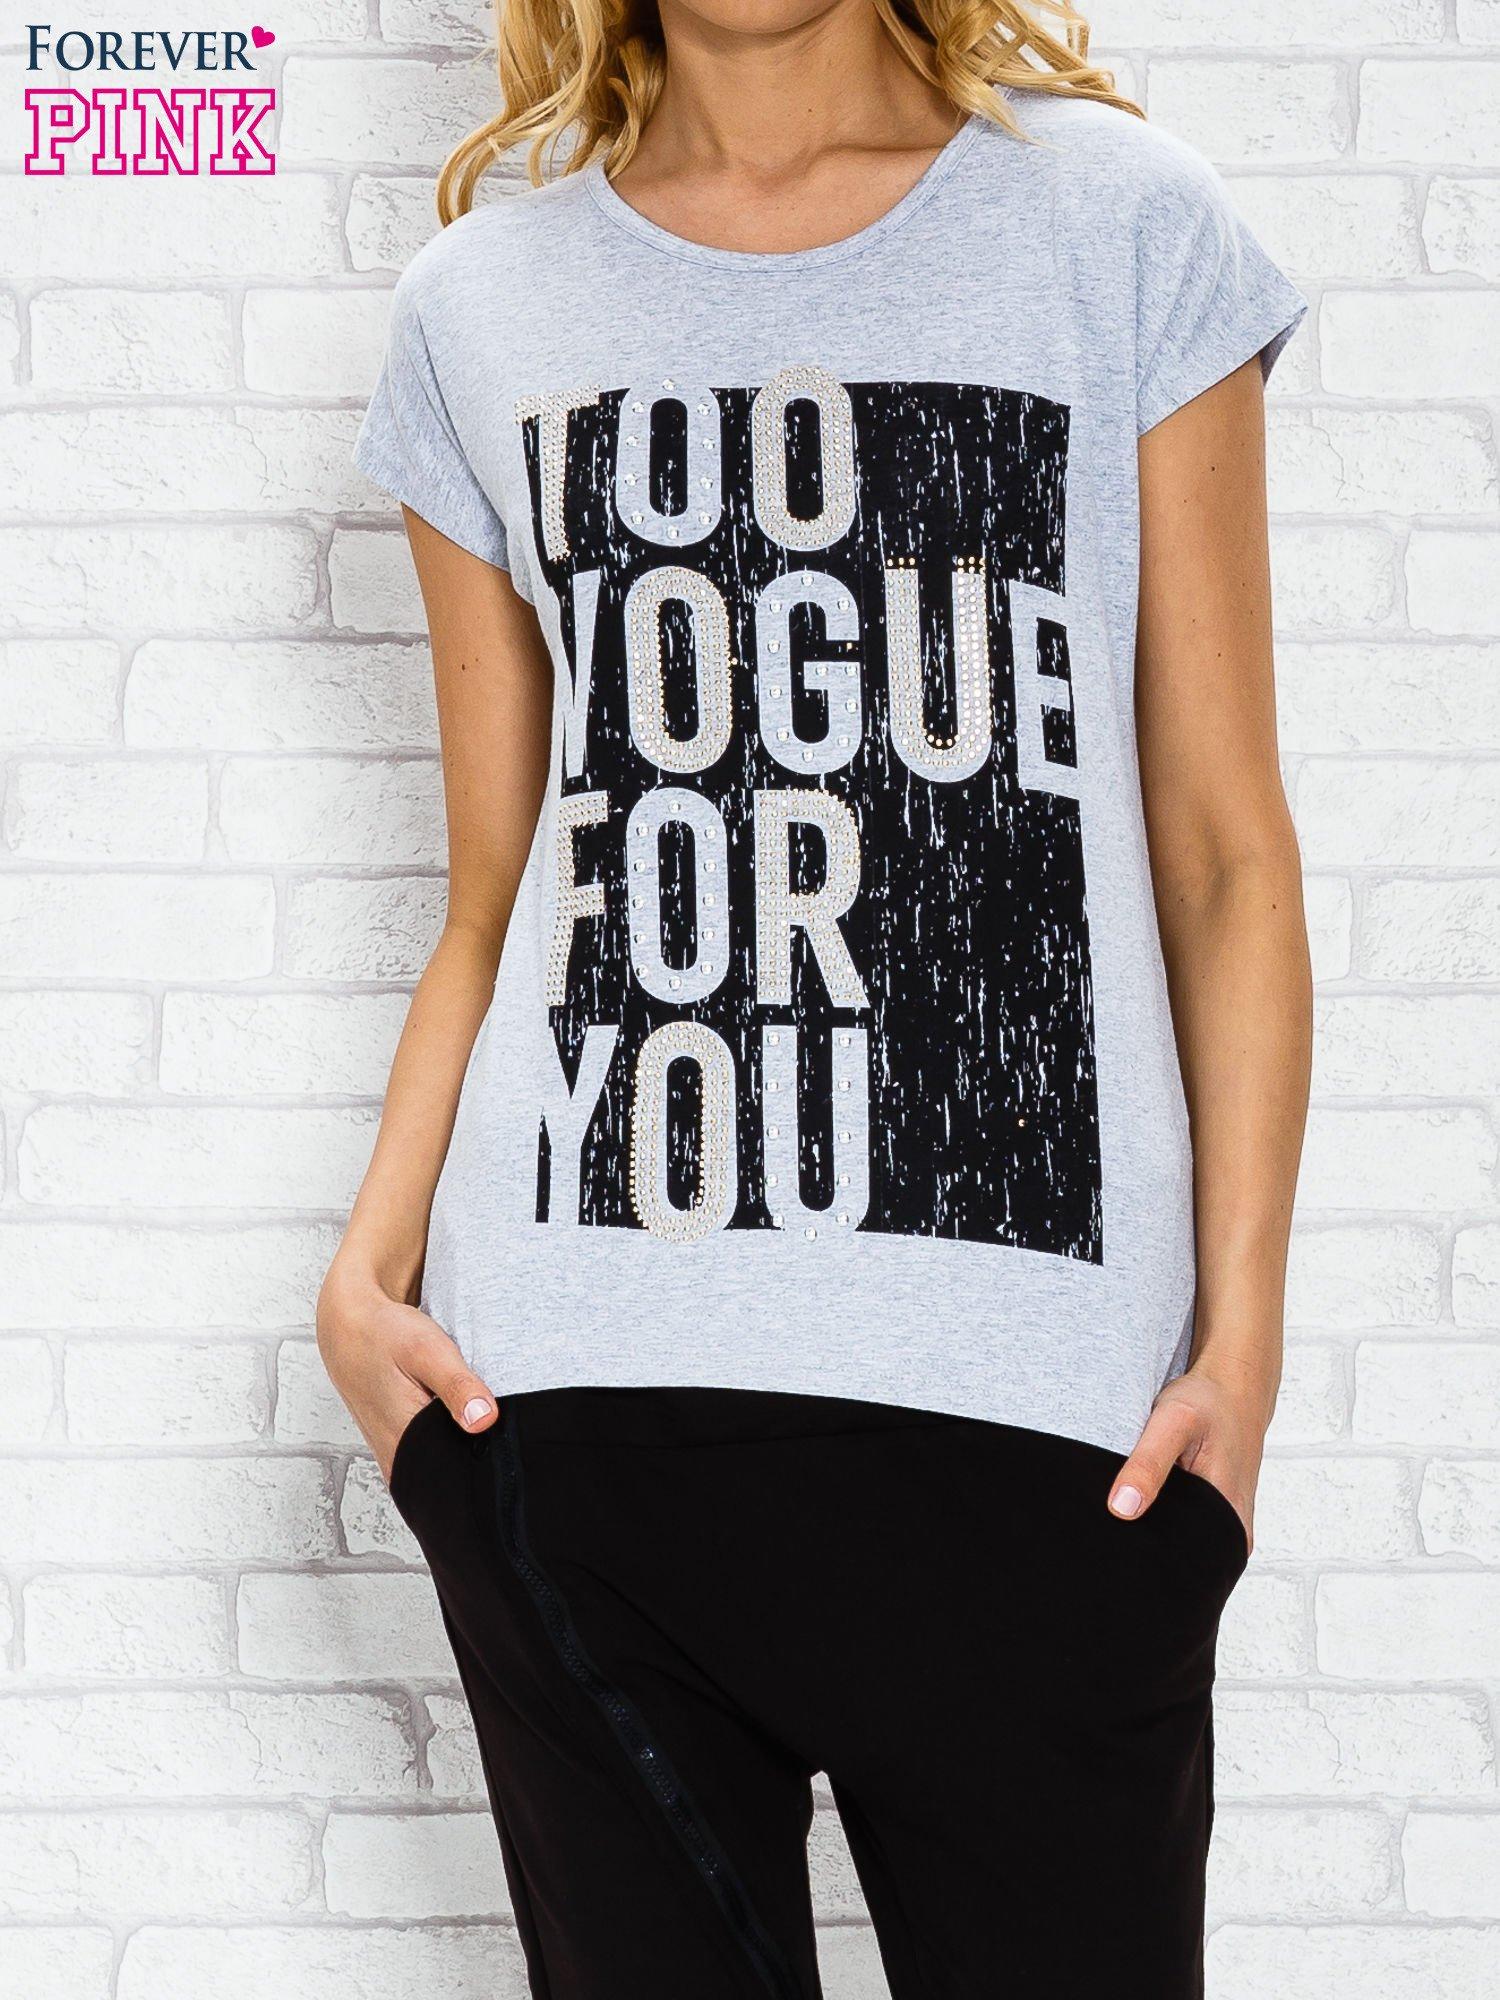 Szary t-shirt z napisem TOO VOGUE FOR YOU z dżetami                                  zdj.                                  1